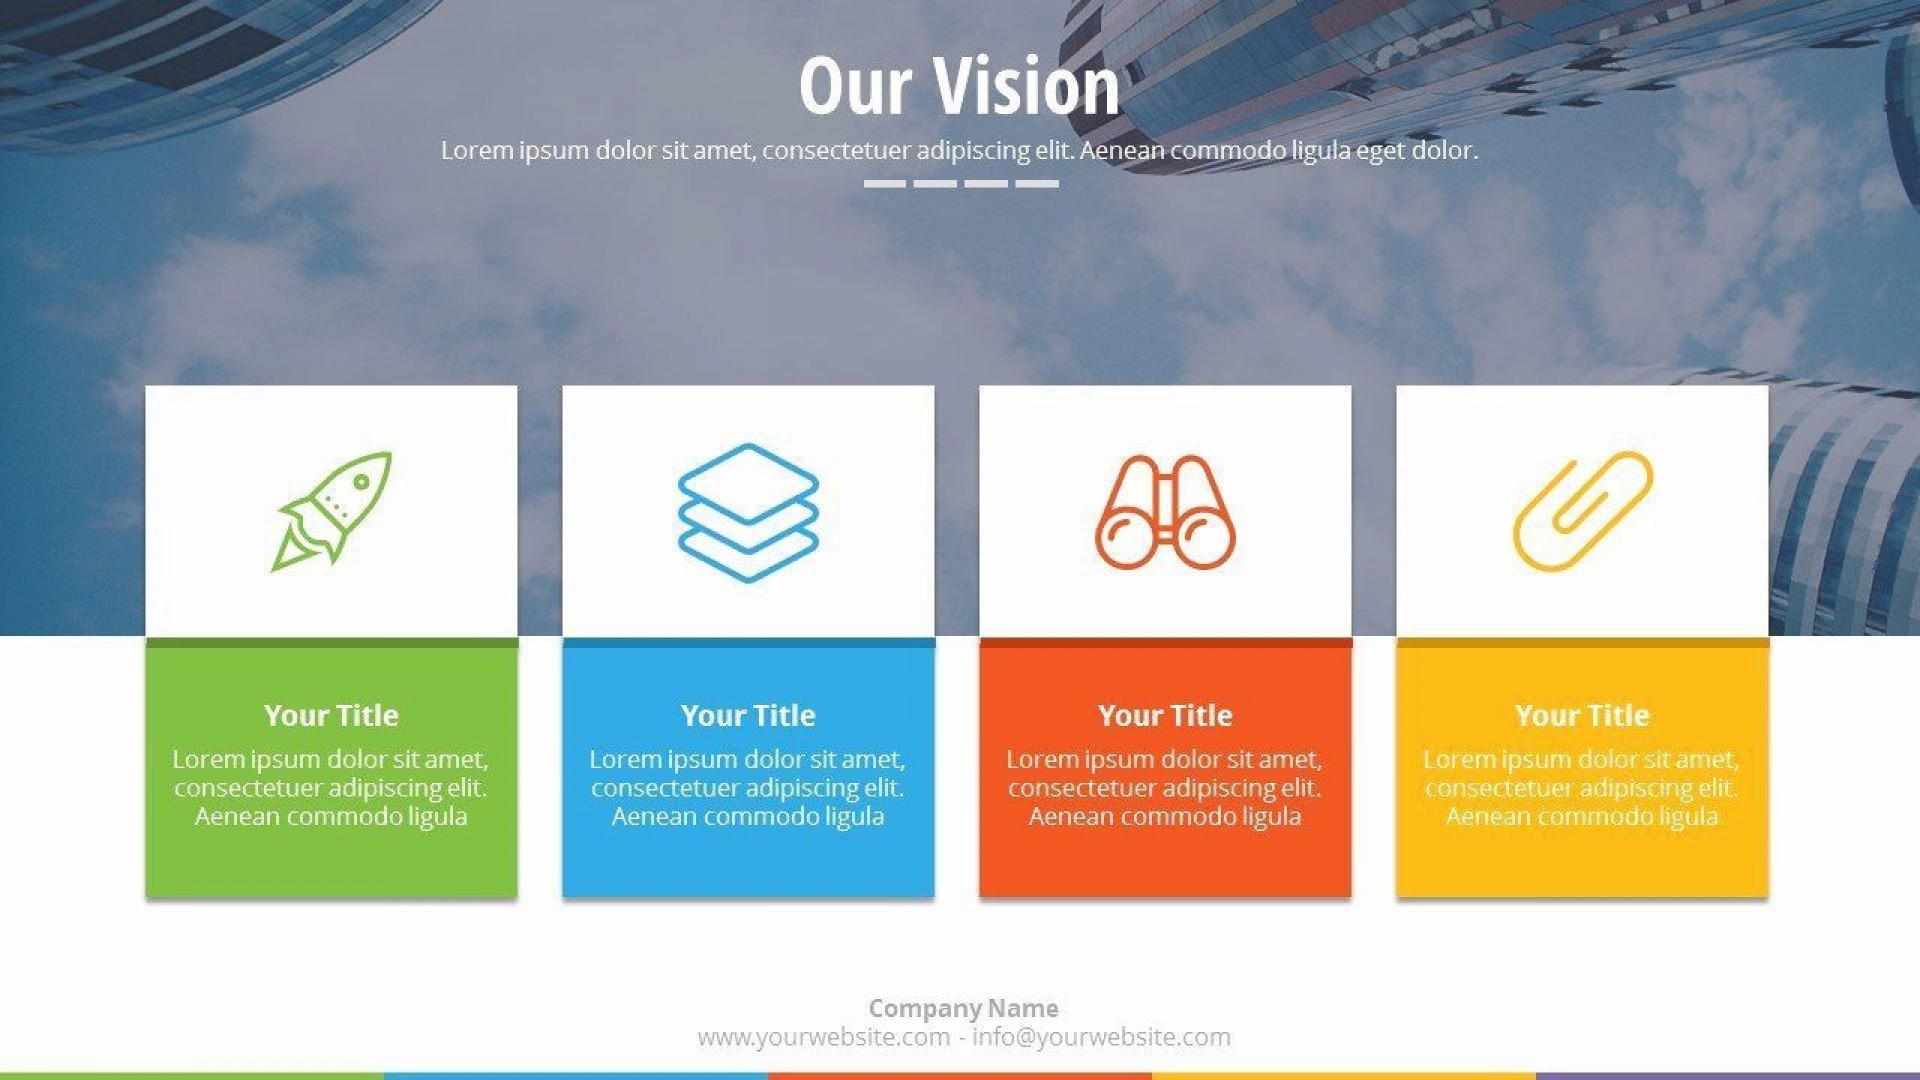 006 Impressive Startup Busines Plan Template Ppt Concept  Free1920